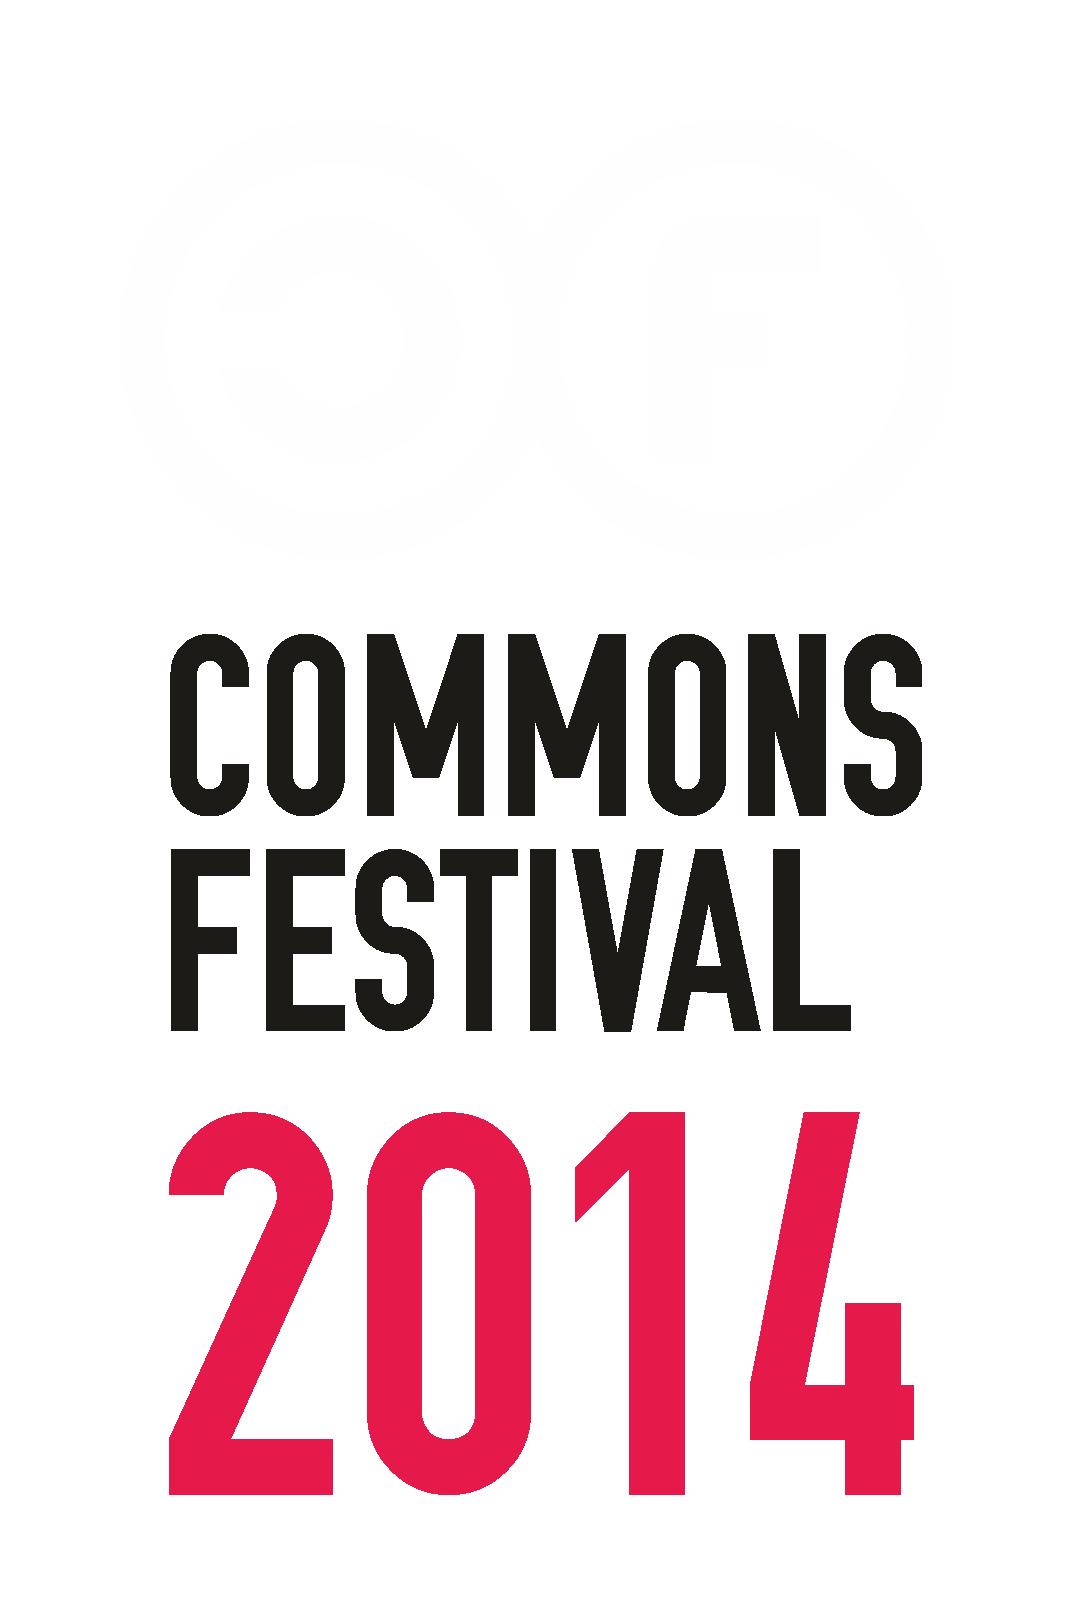 Commons Festival_ΛΟΓΟΤΥΠΟ_2014